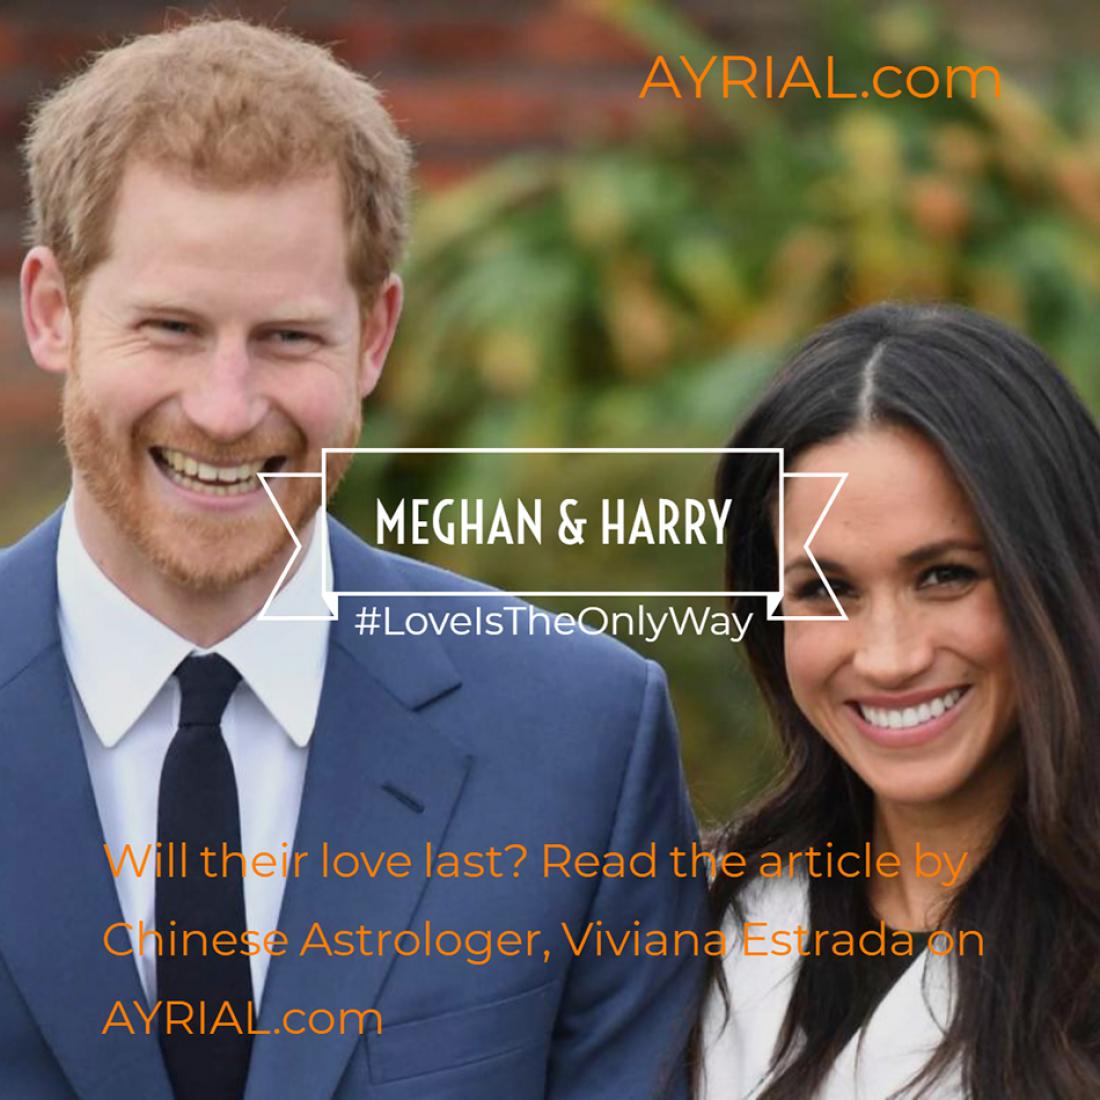 Meghan-Harry-Will their Love Last